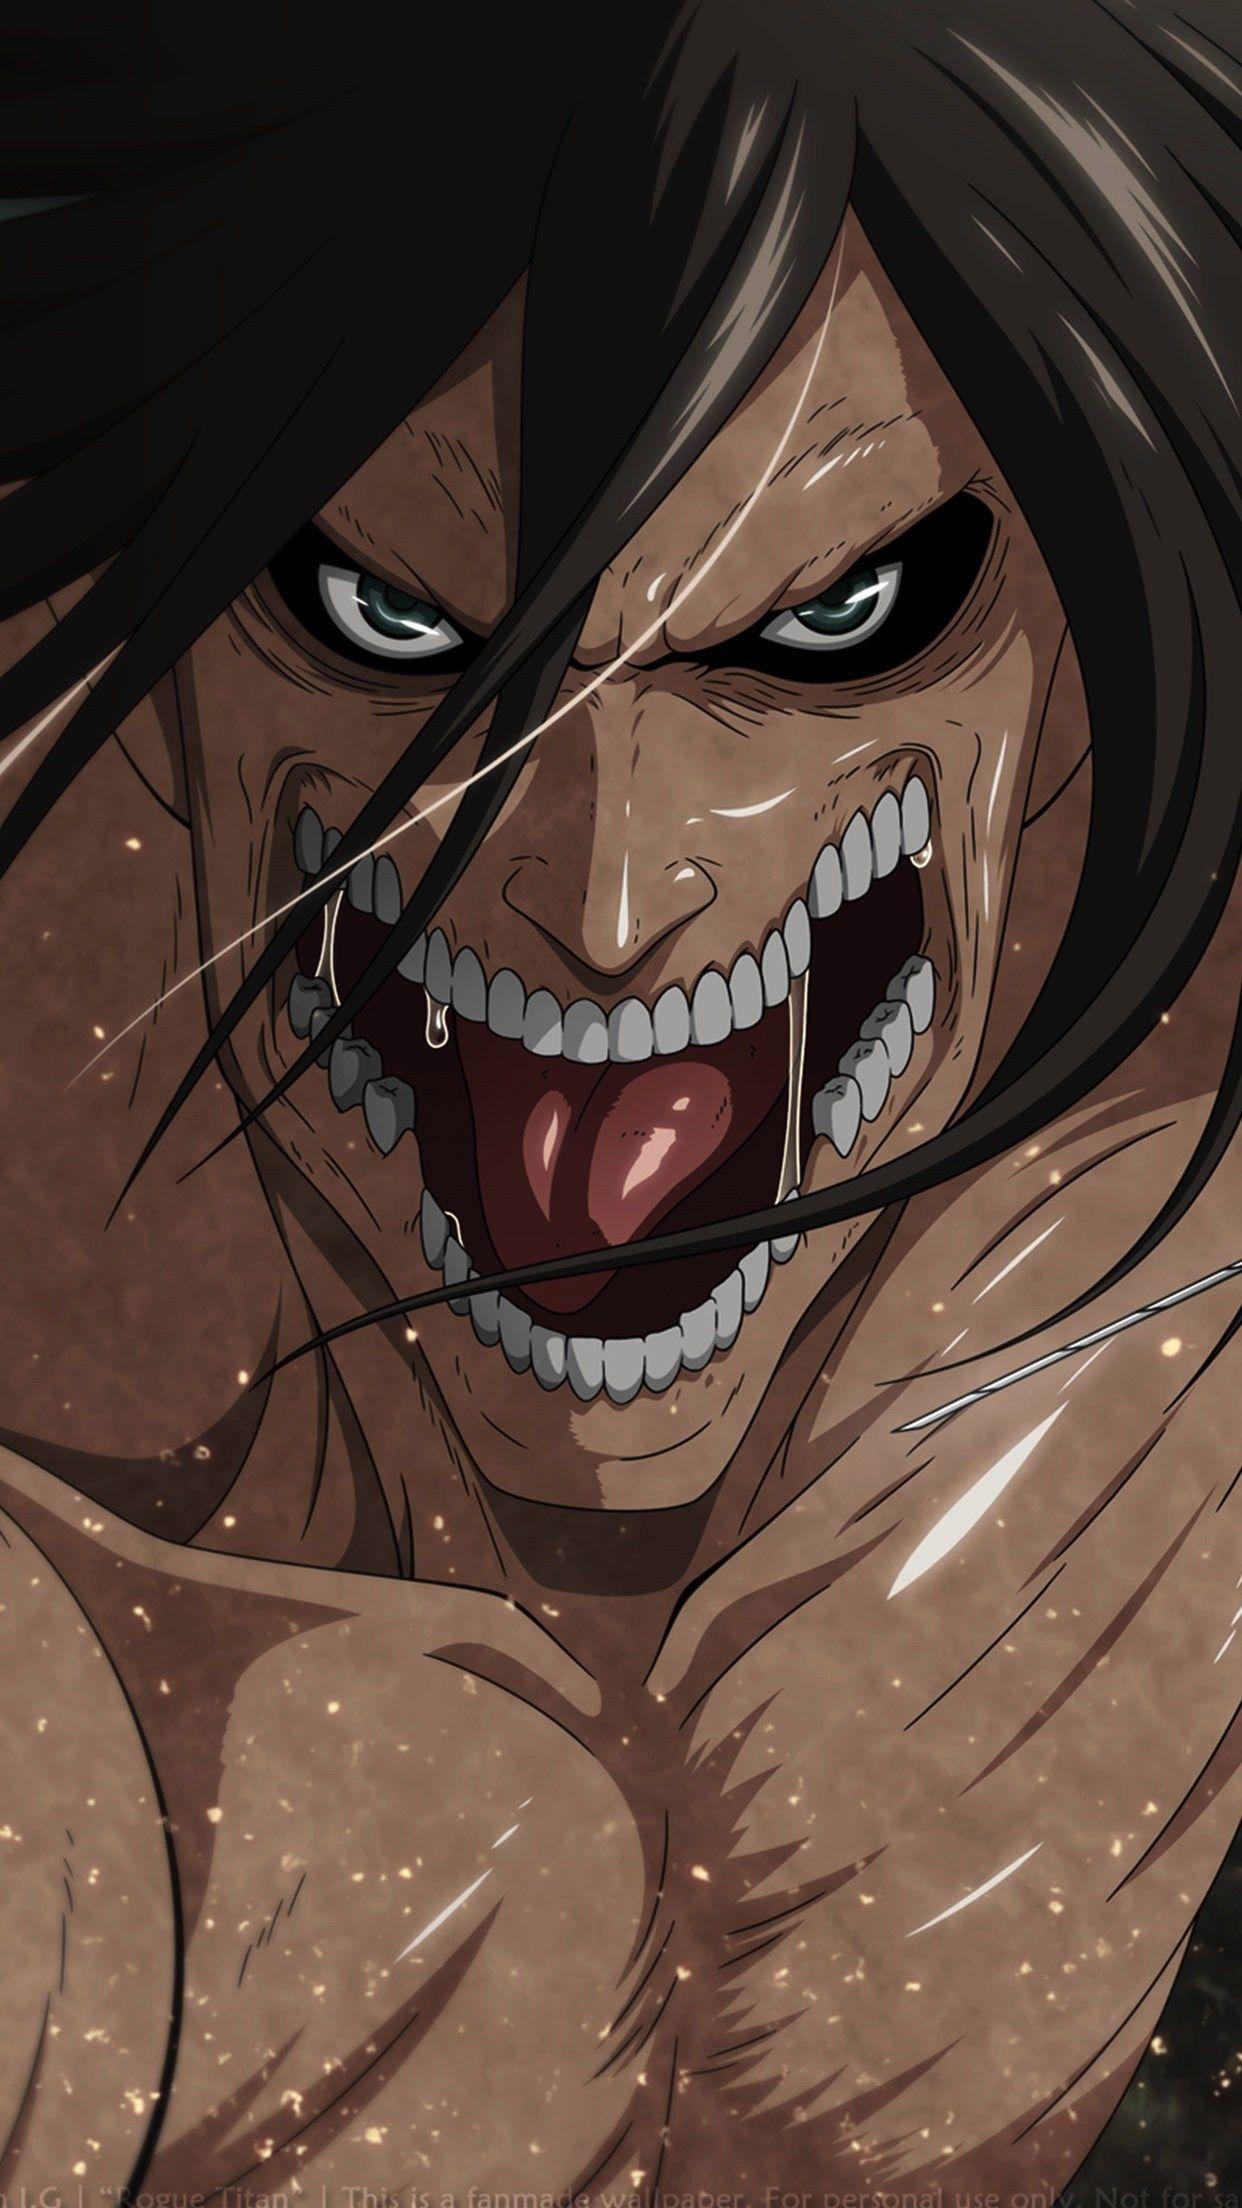 Photo of 進撃の巨人 / Attack on Titan